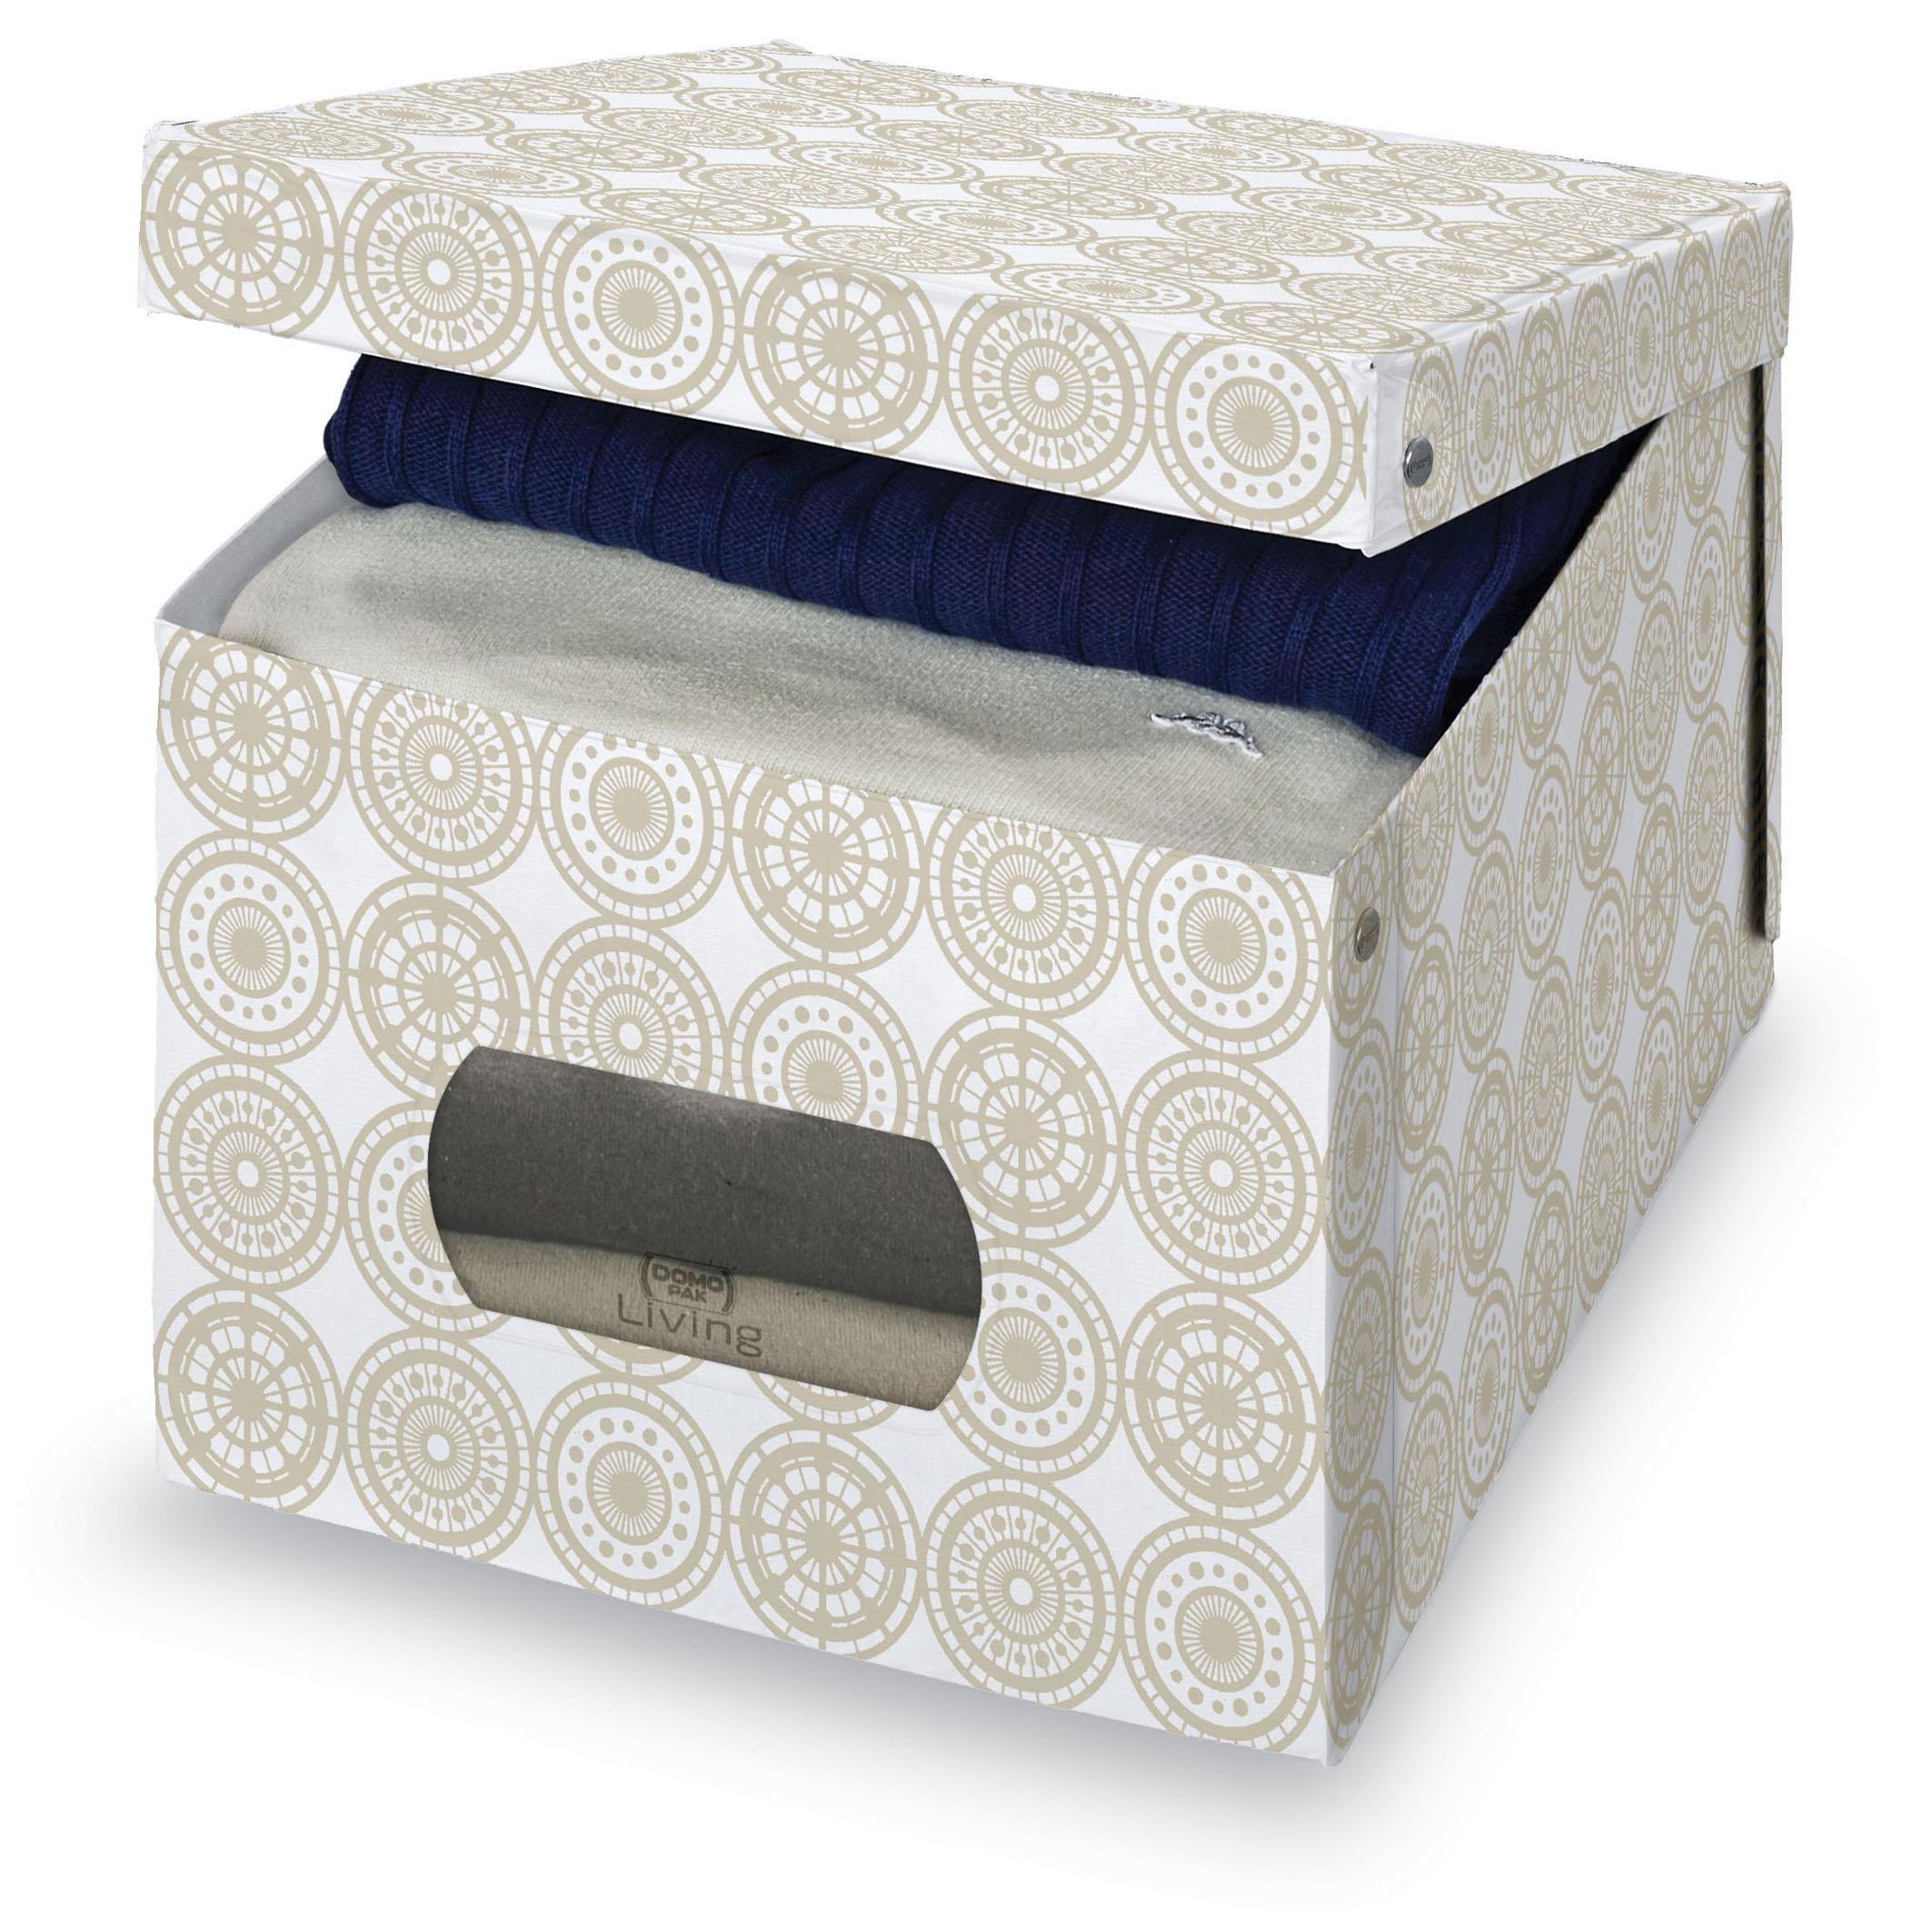 DOMOPAK Living Úložný box s oknem s ornamenty Velikost: menší